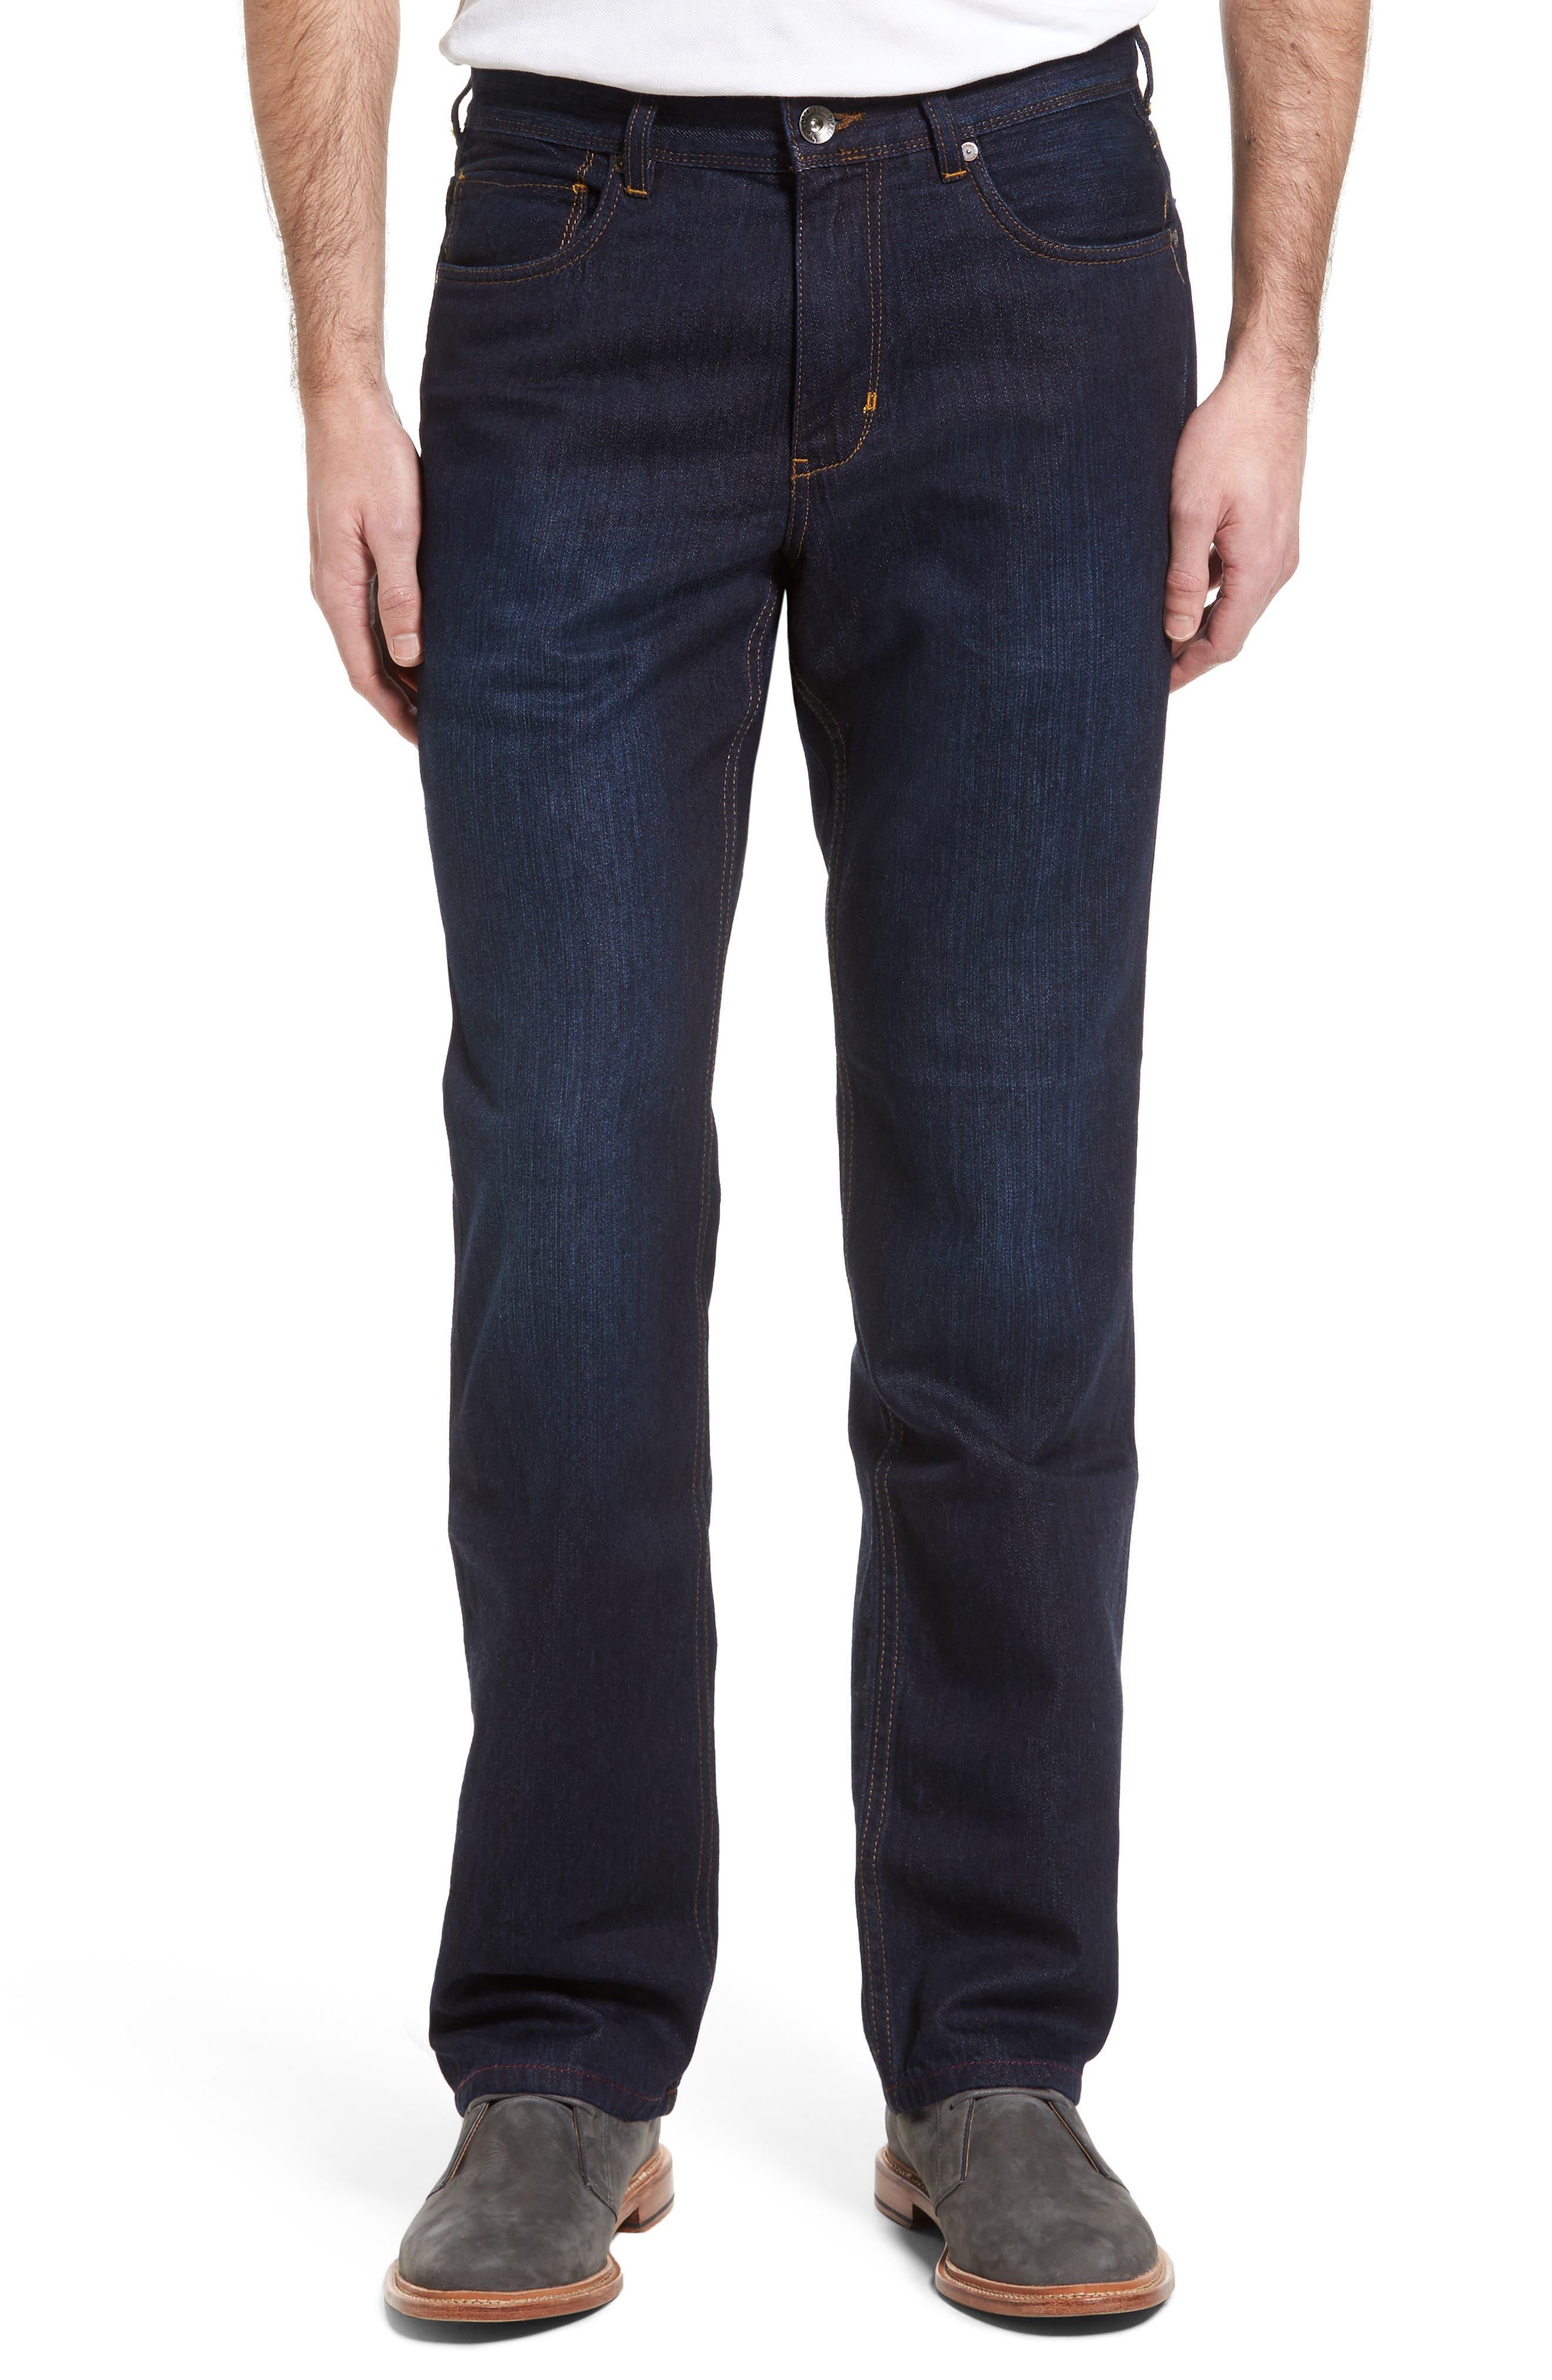 TOMMY BAHAMA 'Cayman' Straight Leg Jeans